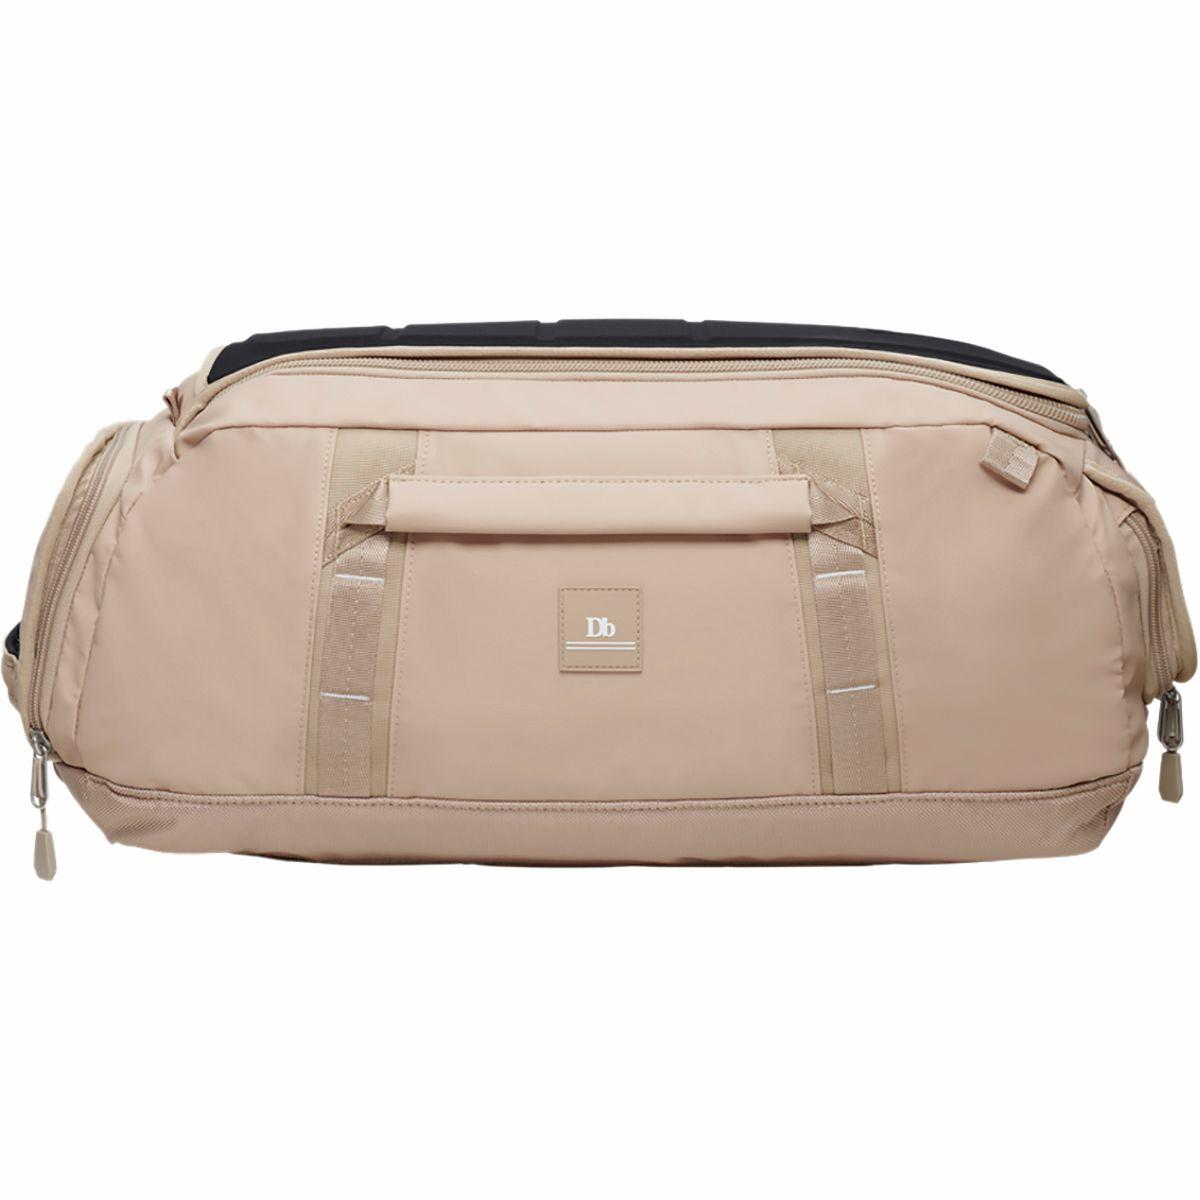 Sports Gym Bag Fitness Running Yoga Handbag Travel Package Cylinder Bag Fashion